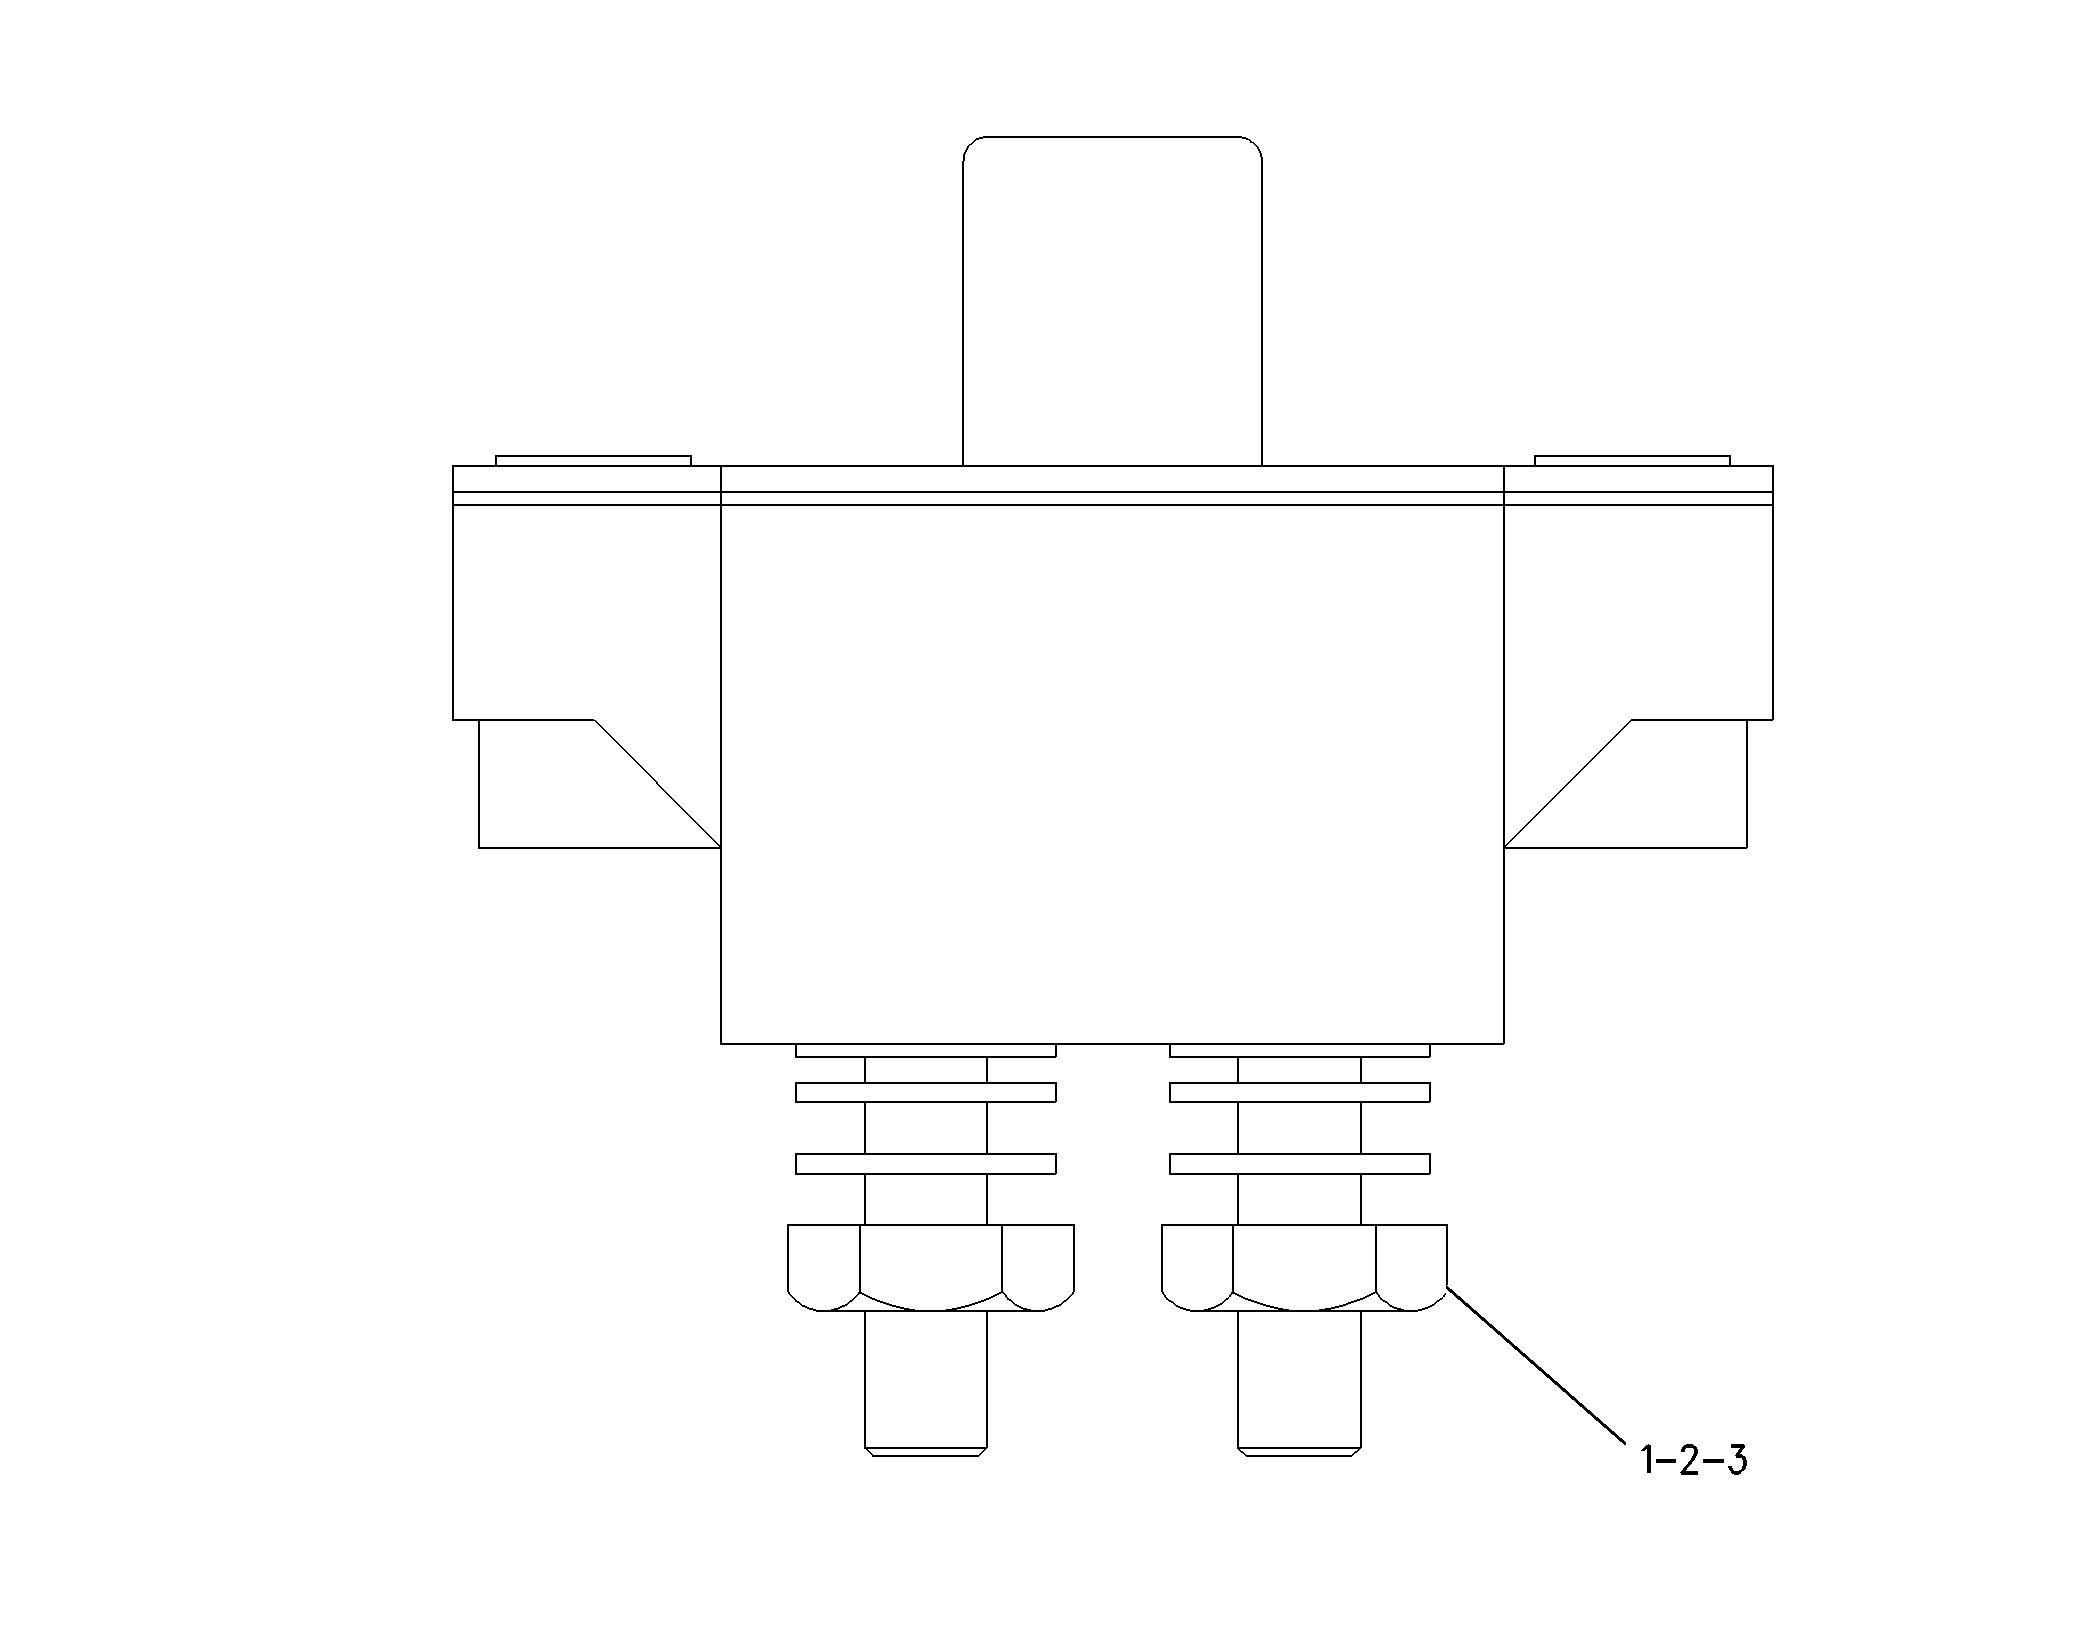 Charming Cat C15 Wiring Diagram Photos - Electrical System Block ...